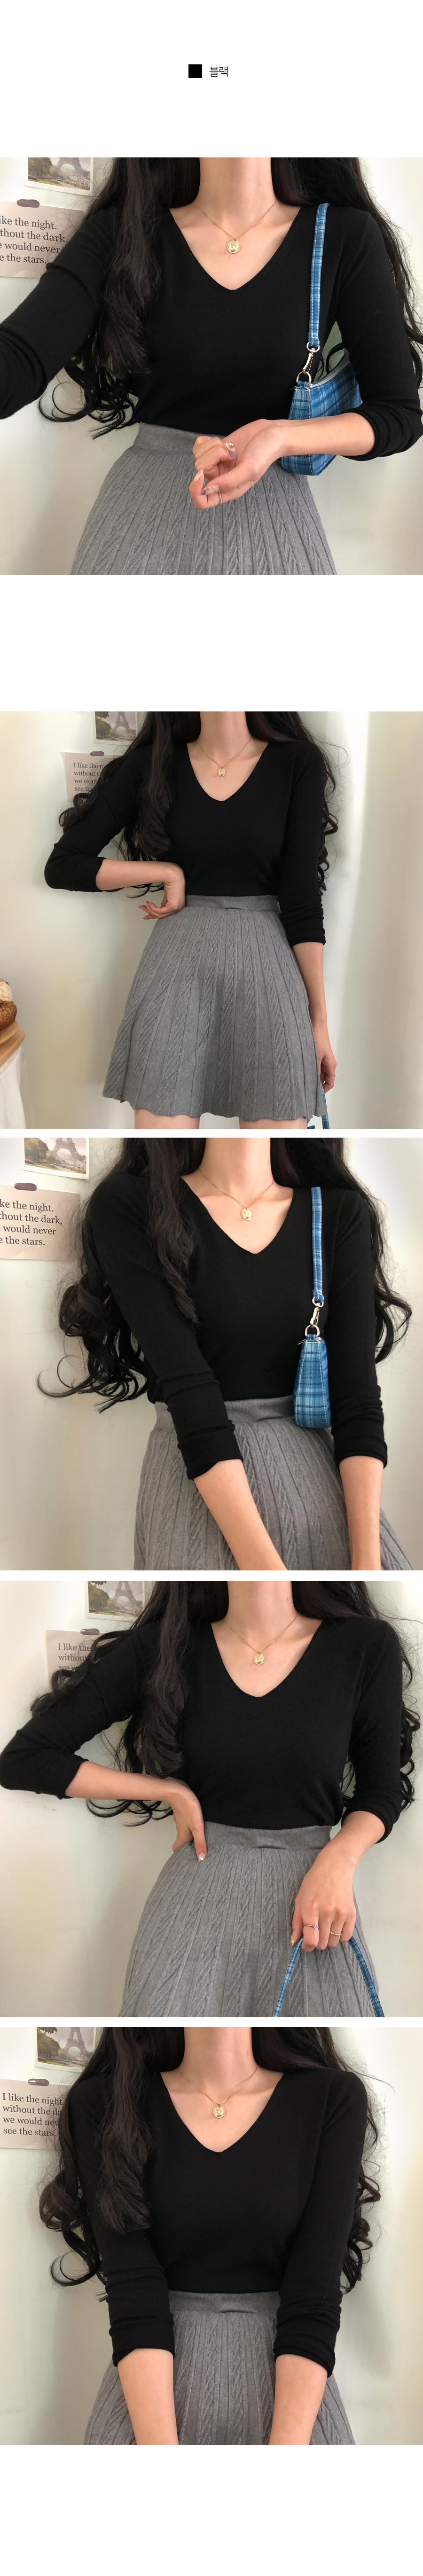 Molcan V-neck long-sleeved knit